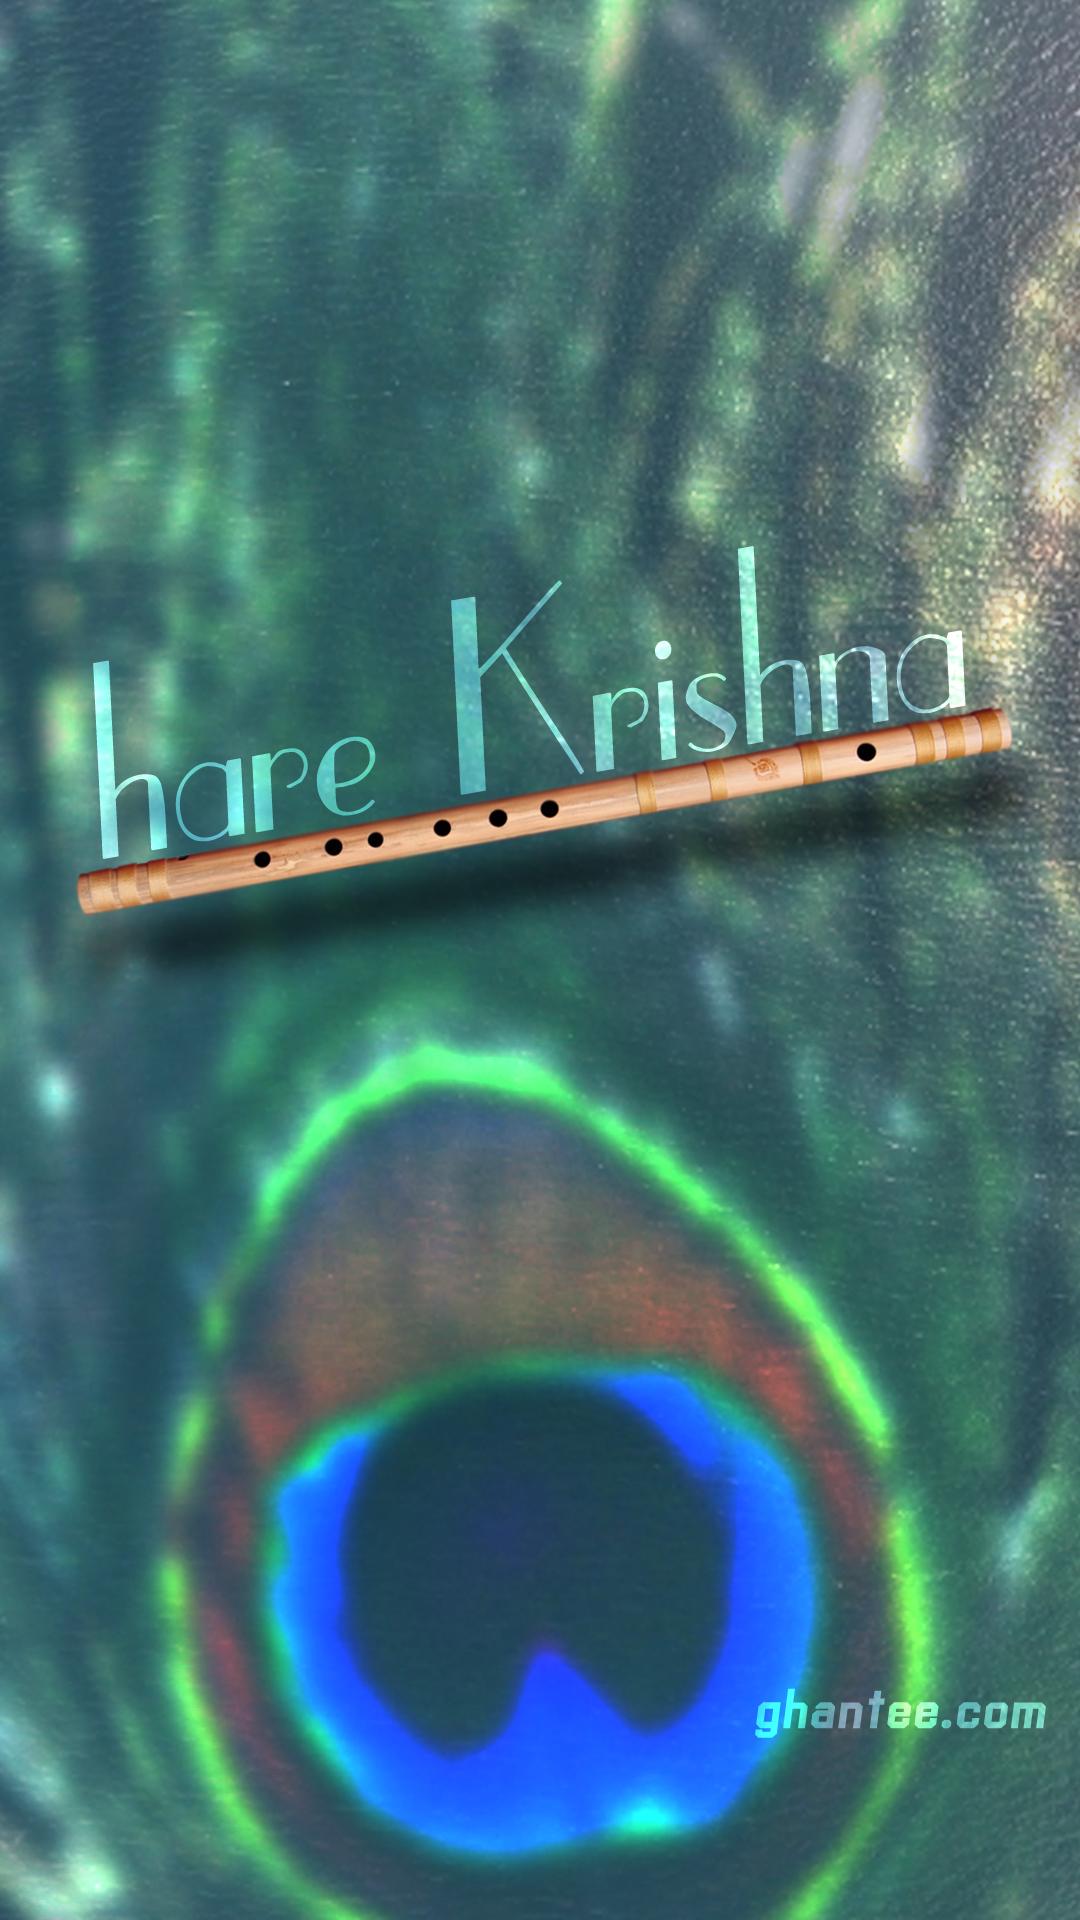 krishna flute hd phone wallpaper